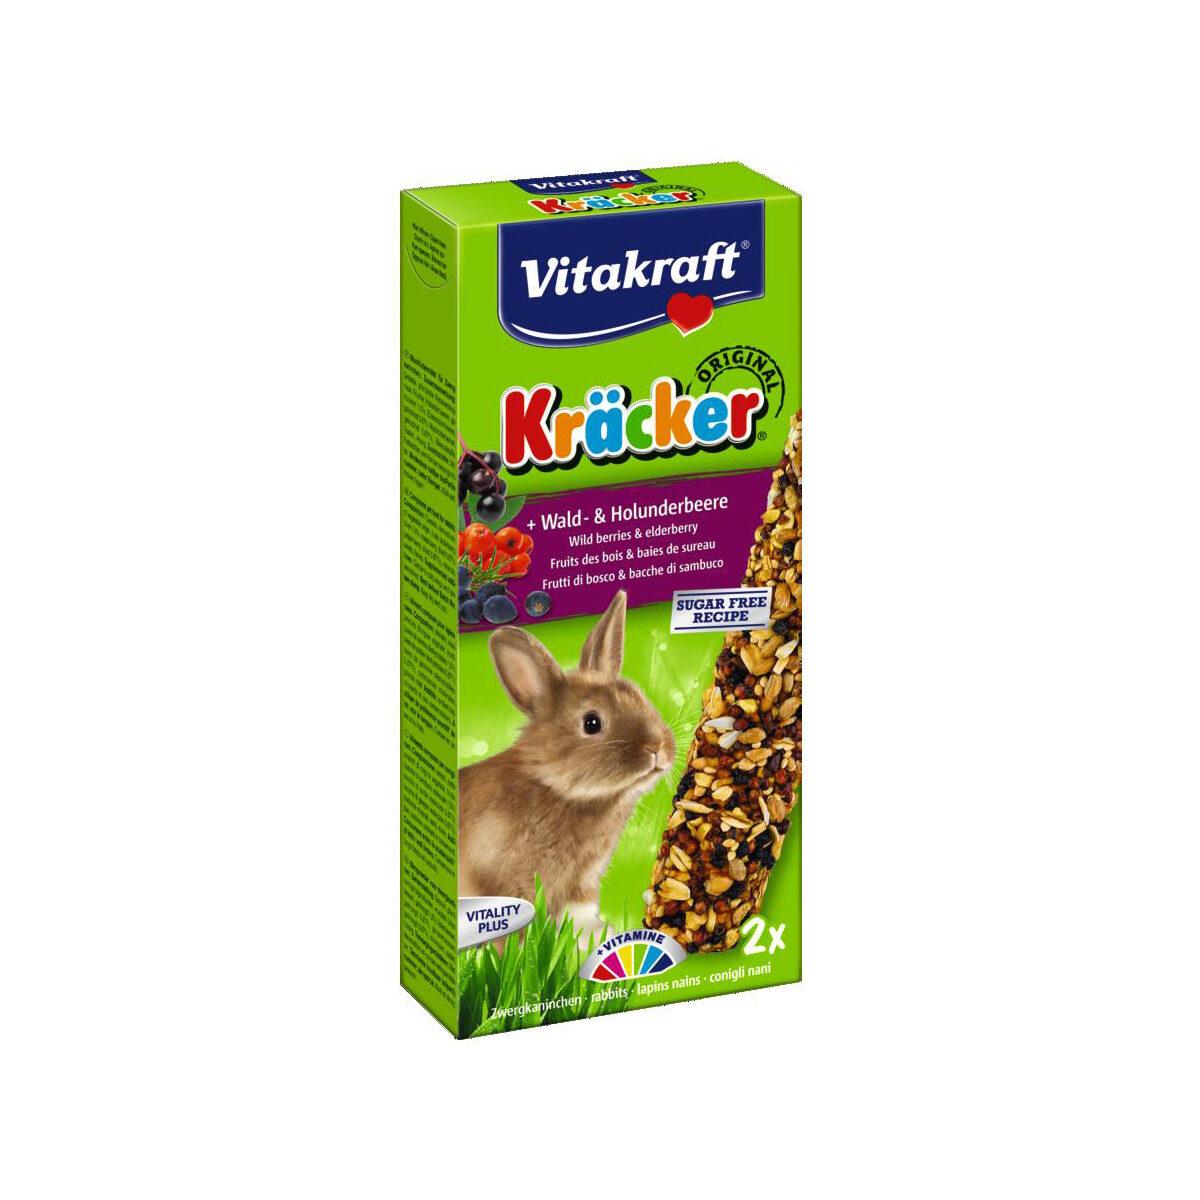 Vitakraft Kracker Konijnensnack Bosbessen 2 stuks